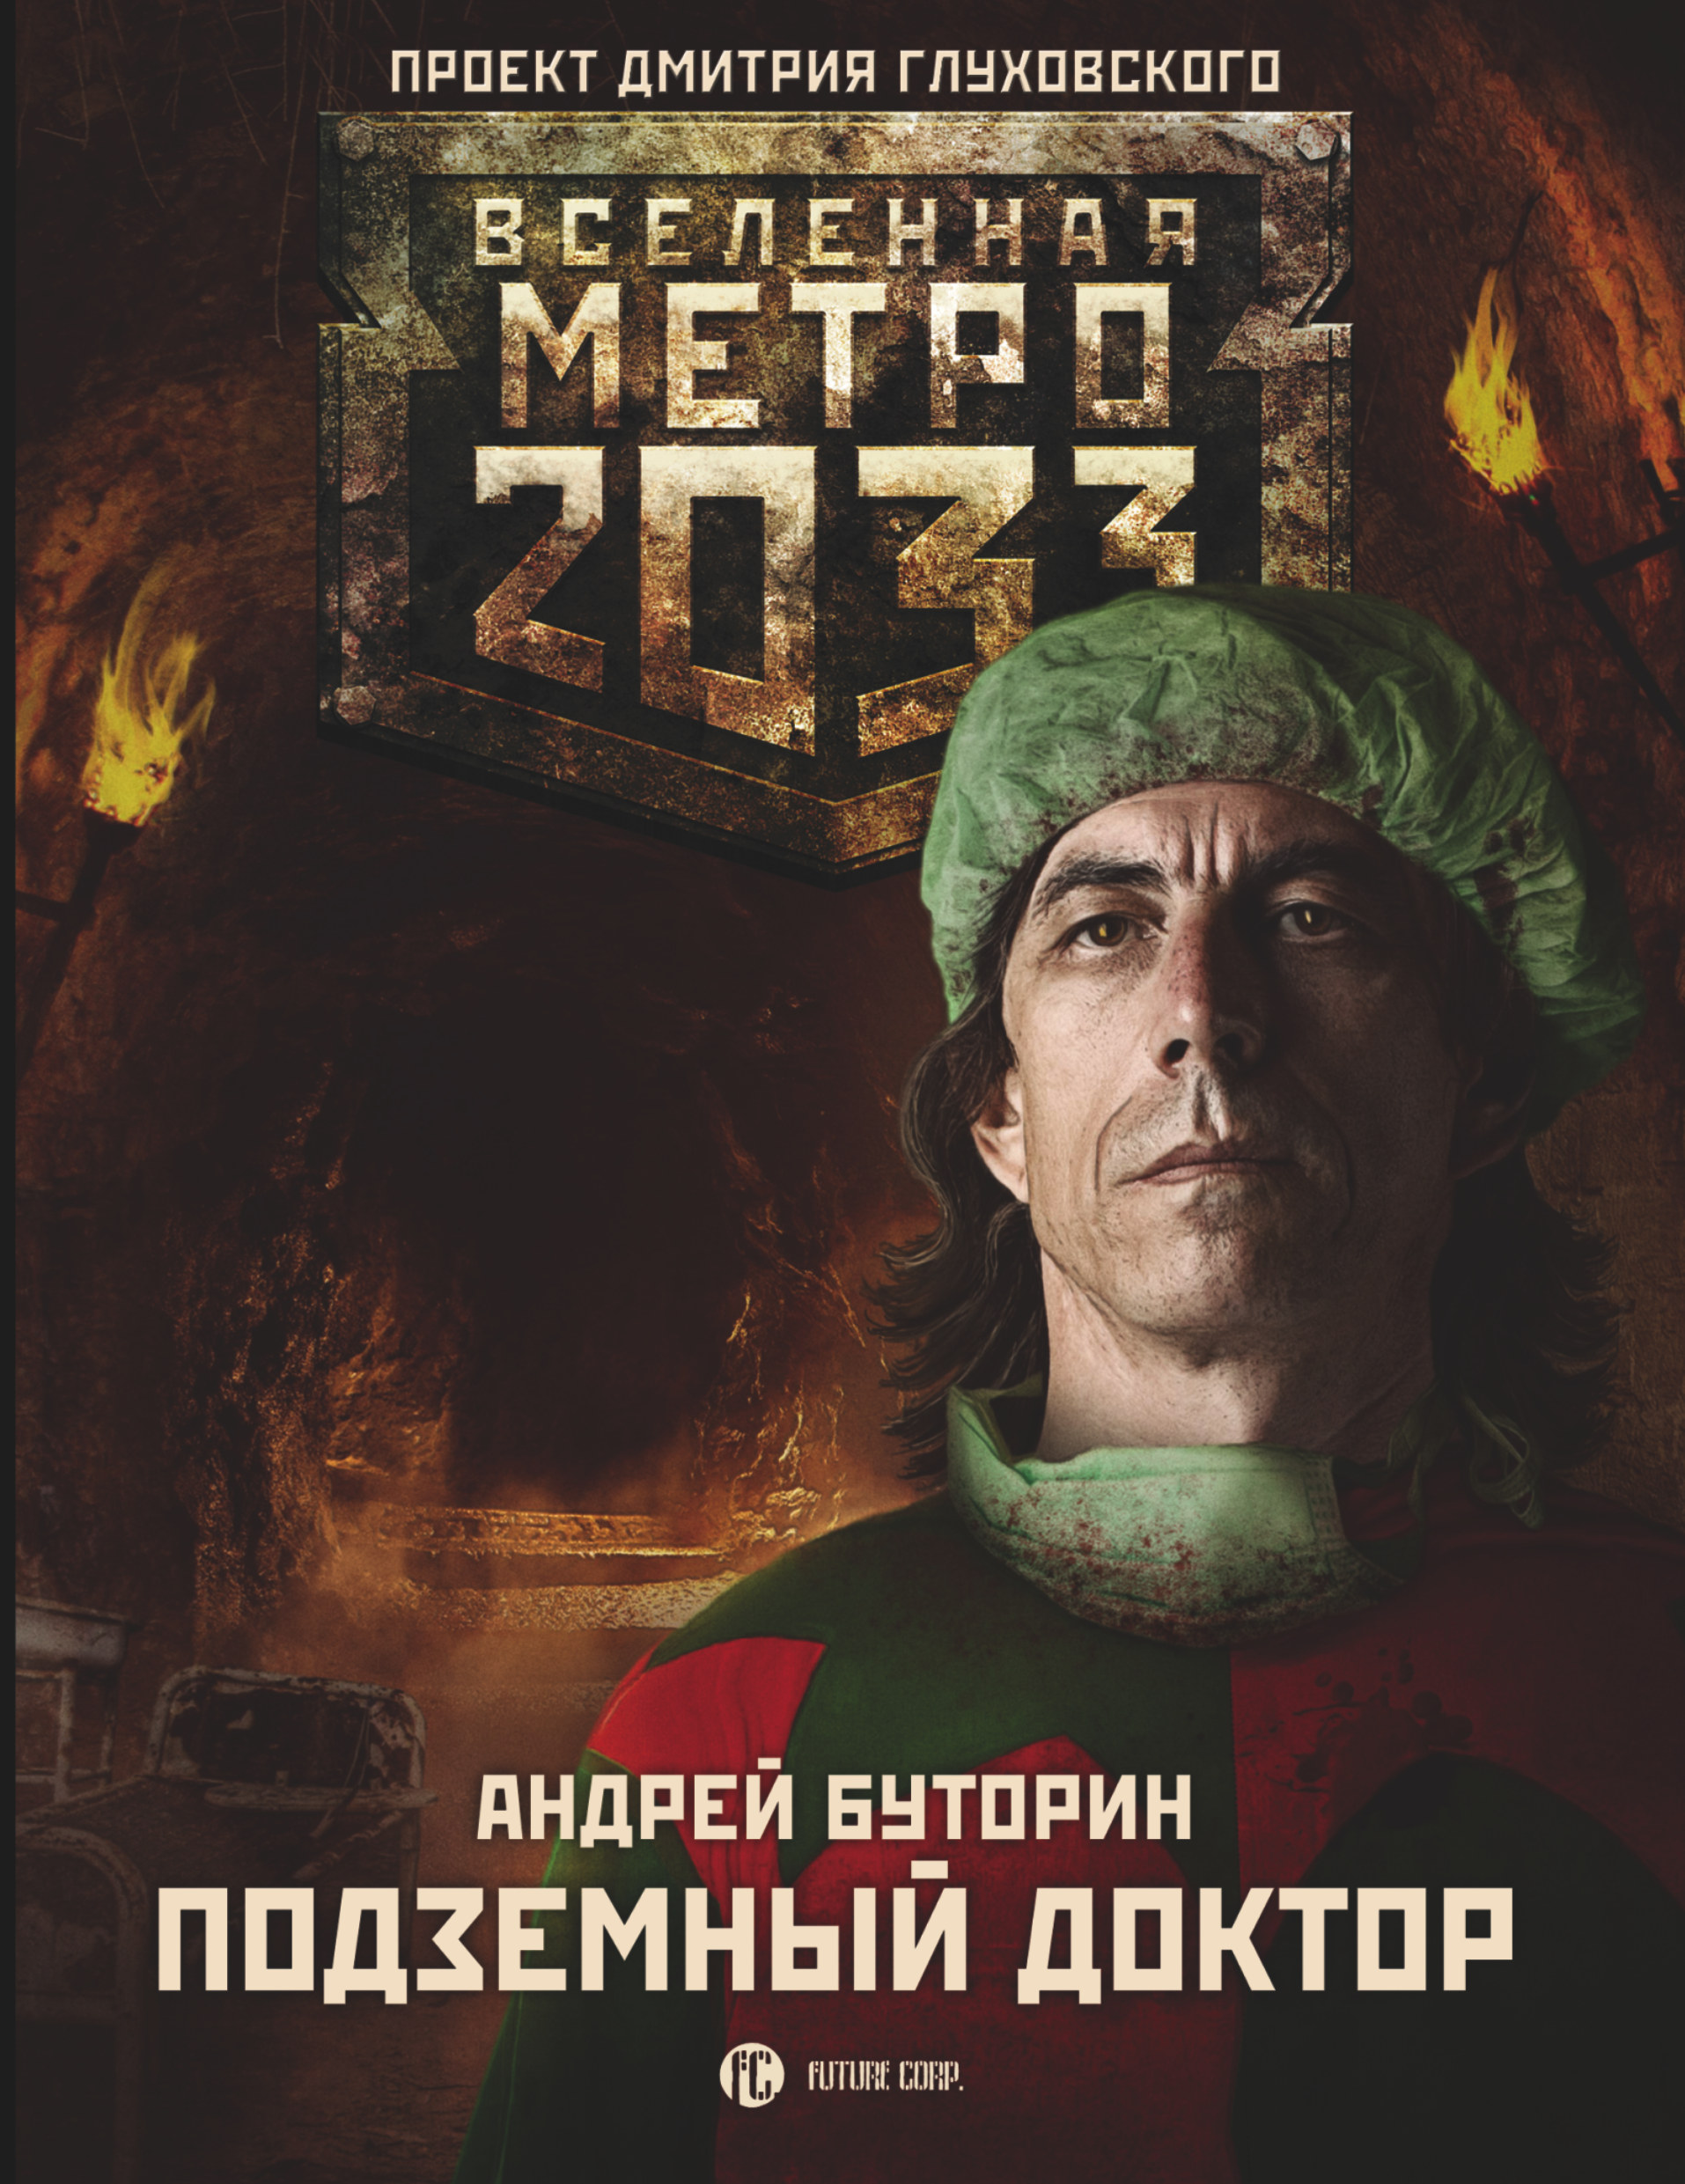 Буторин А.Р. Метро 2033: Подземный доктор шабалов д метро 2033 право на жизнь